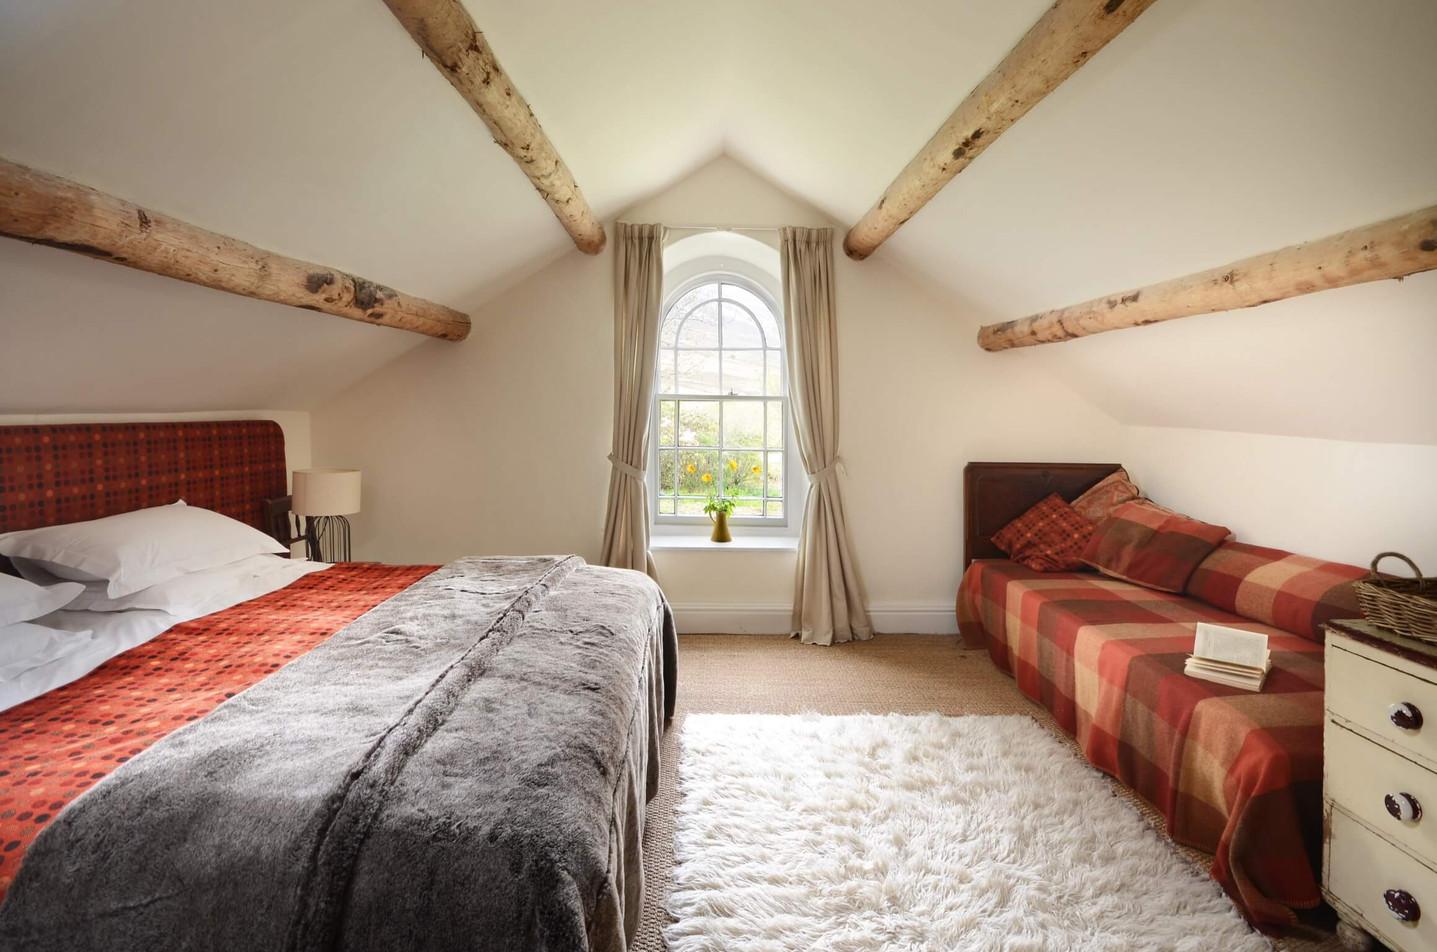 Mountain_Cottage_Bedroom_1_1.jpg